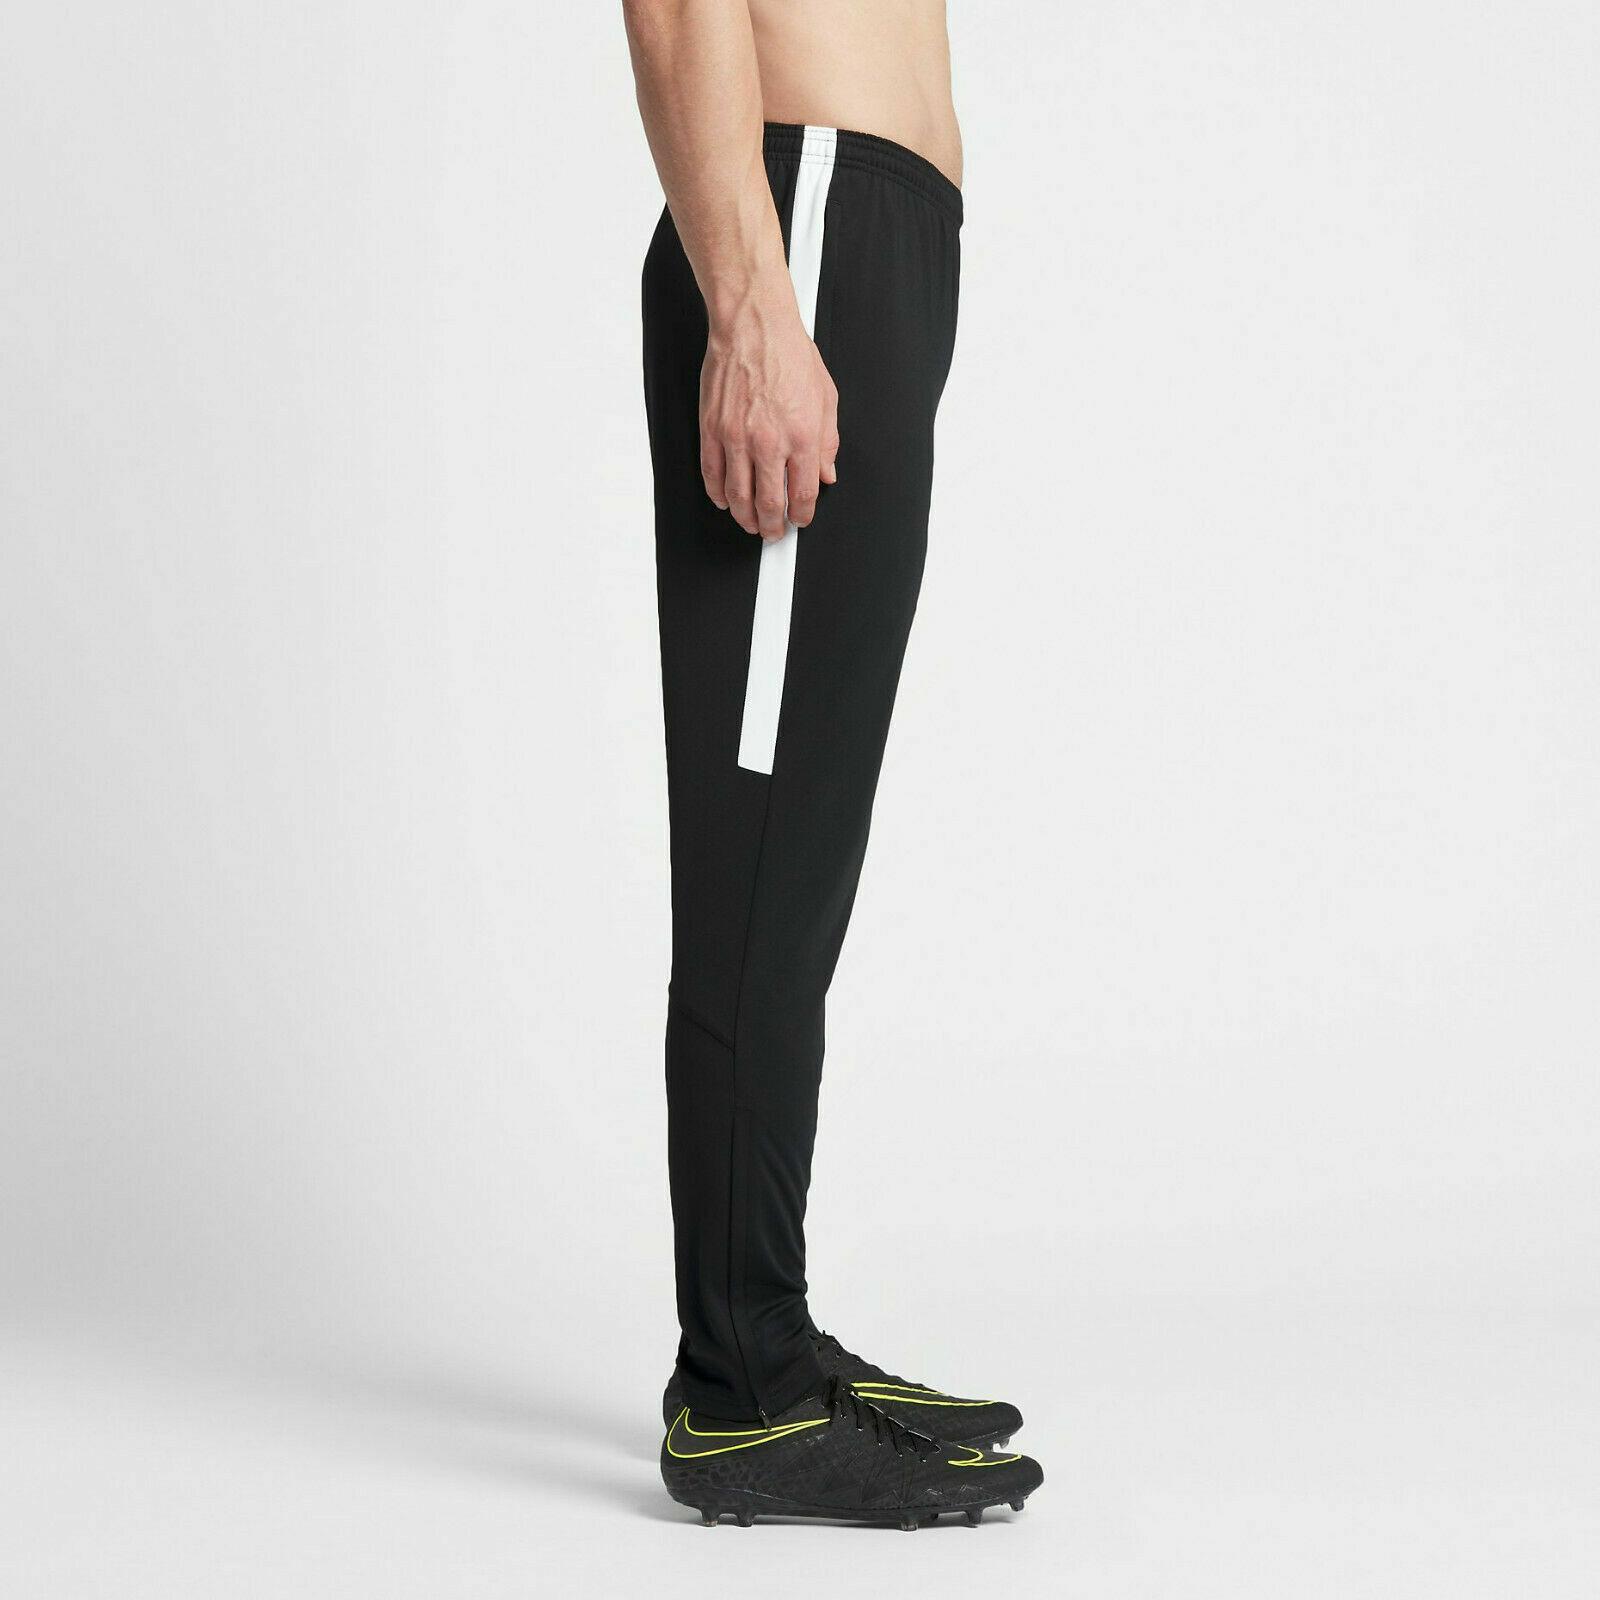 Girar en descubierto lado agudo  Nike 839363-451 Dry Academy Men's Football Pants Obsidian/white for sale  online | eBay